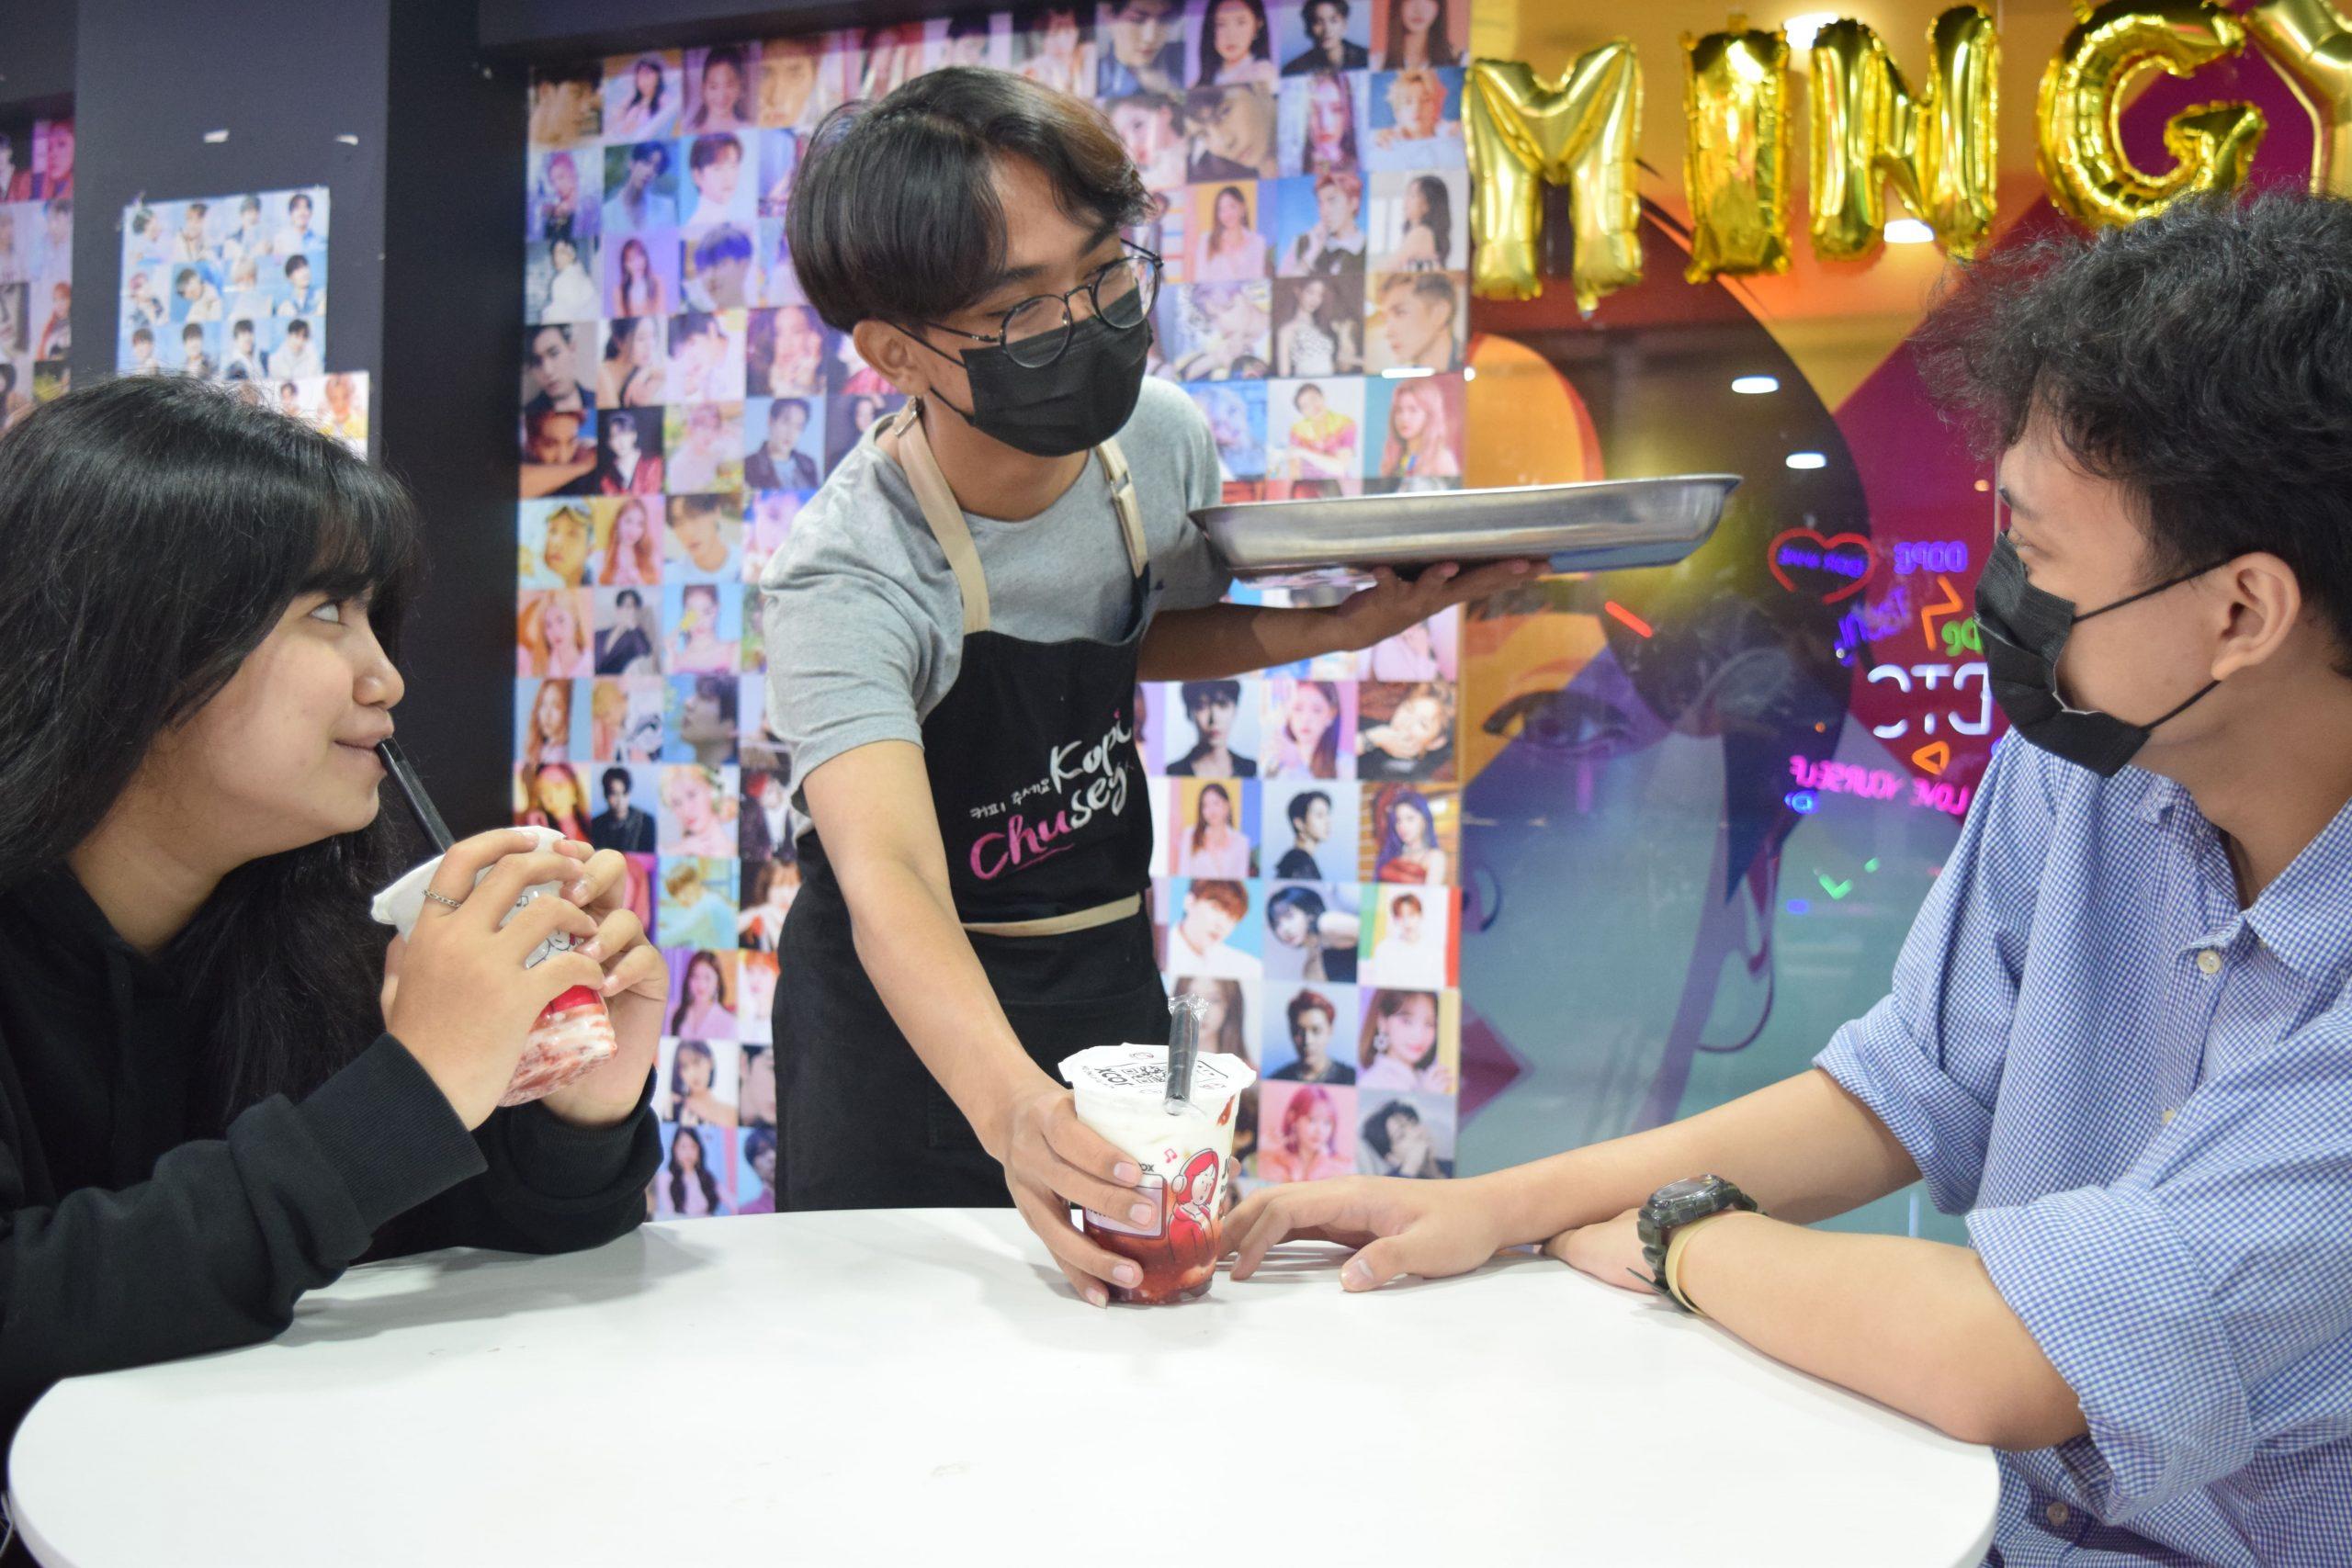 DARI HOBI, MENJADI THE ONLY K-POP HUB IN THE NATION